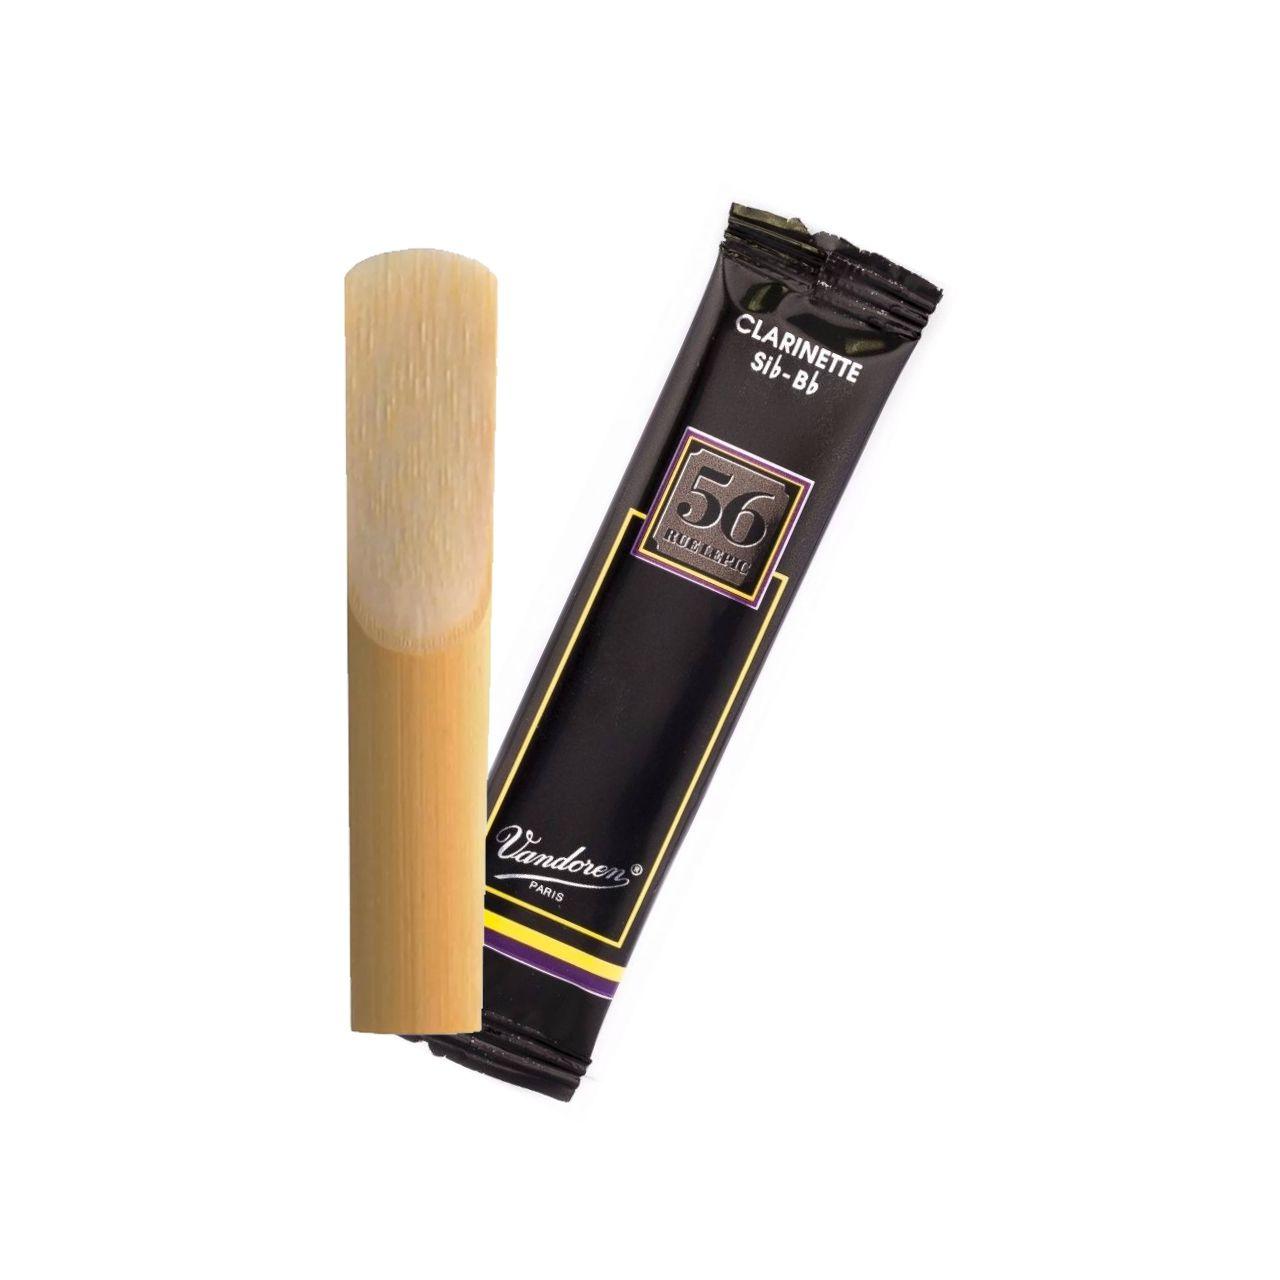 Palheta 56 Rue Lepic 2,5 P/clarinete Sib Cx C/10 Cr5025 Vandoren